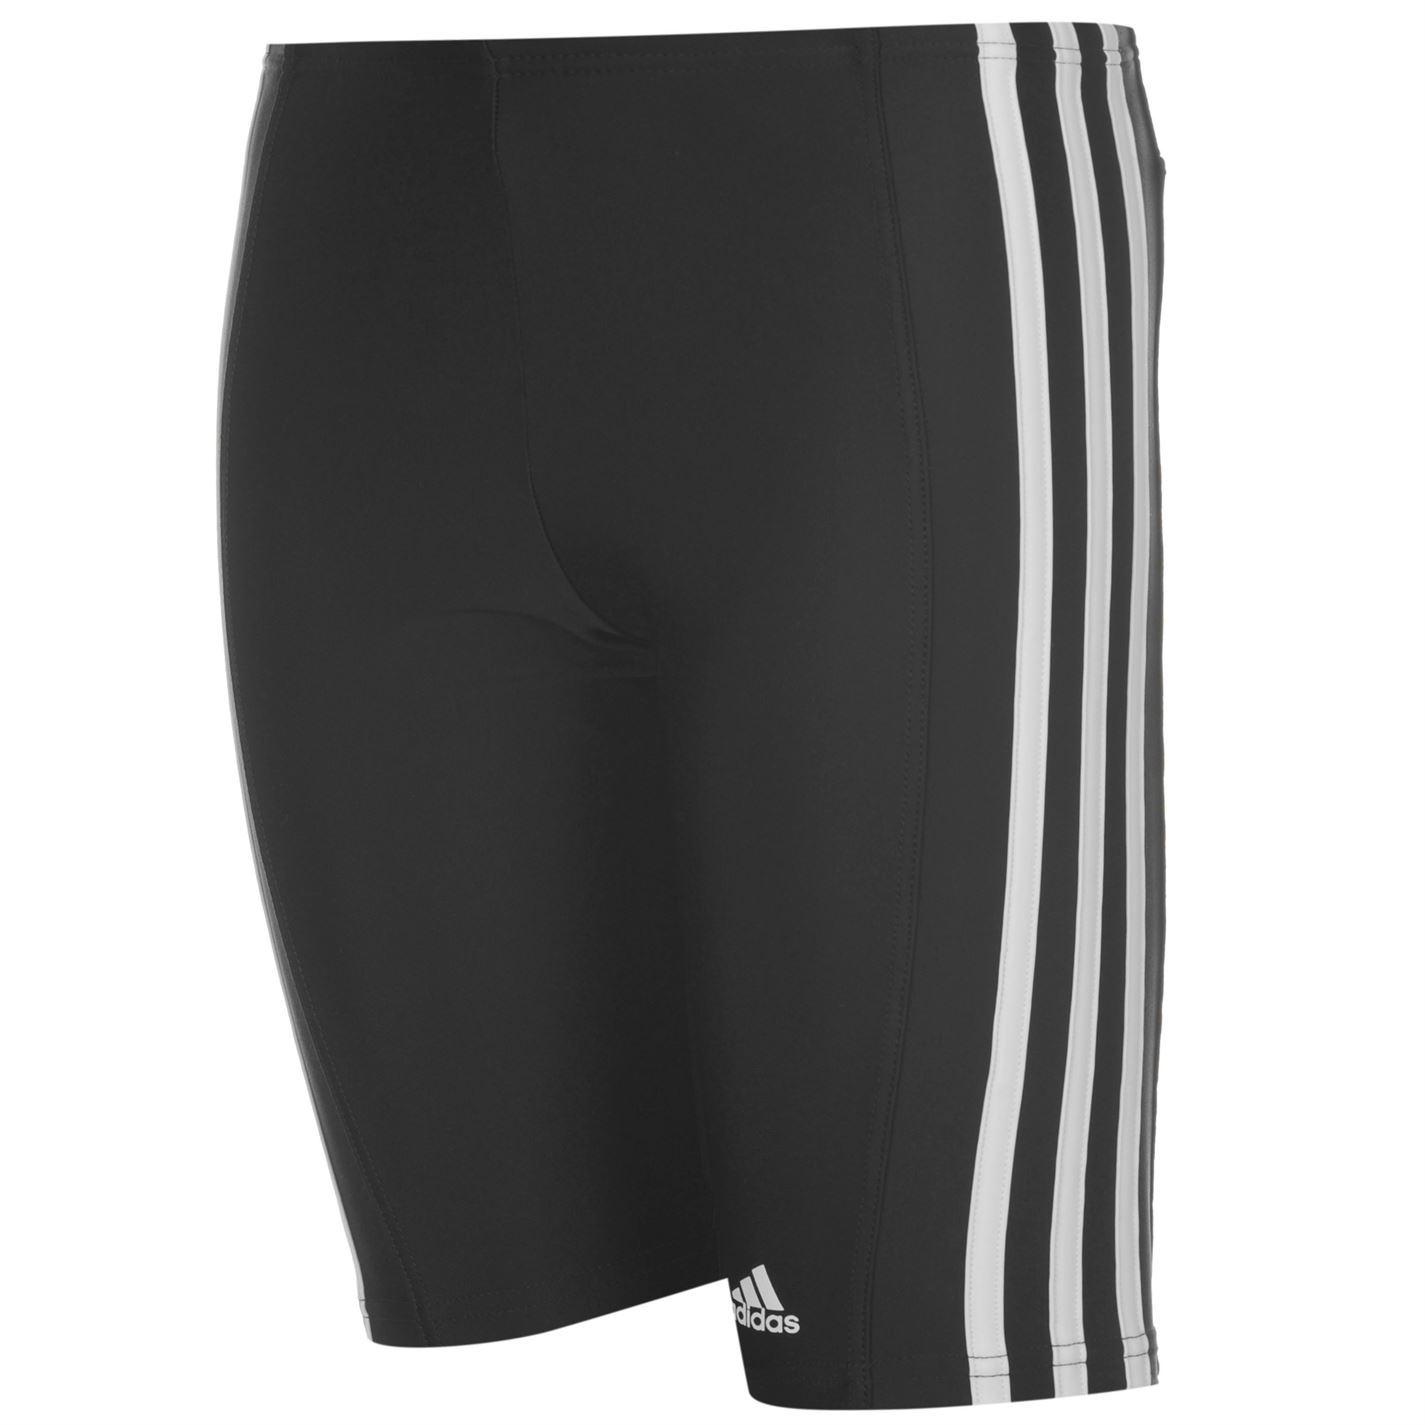 7a29695718f5 adidas Junior Essence Core 3-stripes Jammer - Black 28